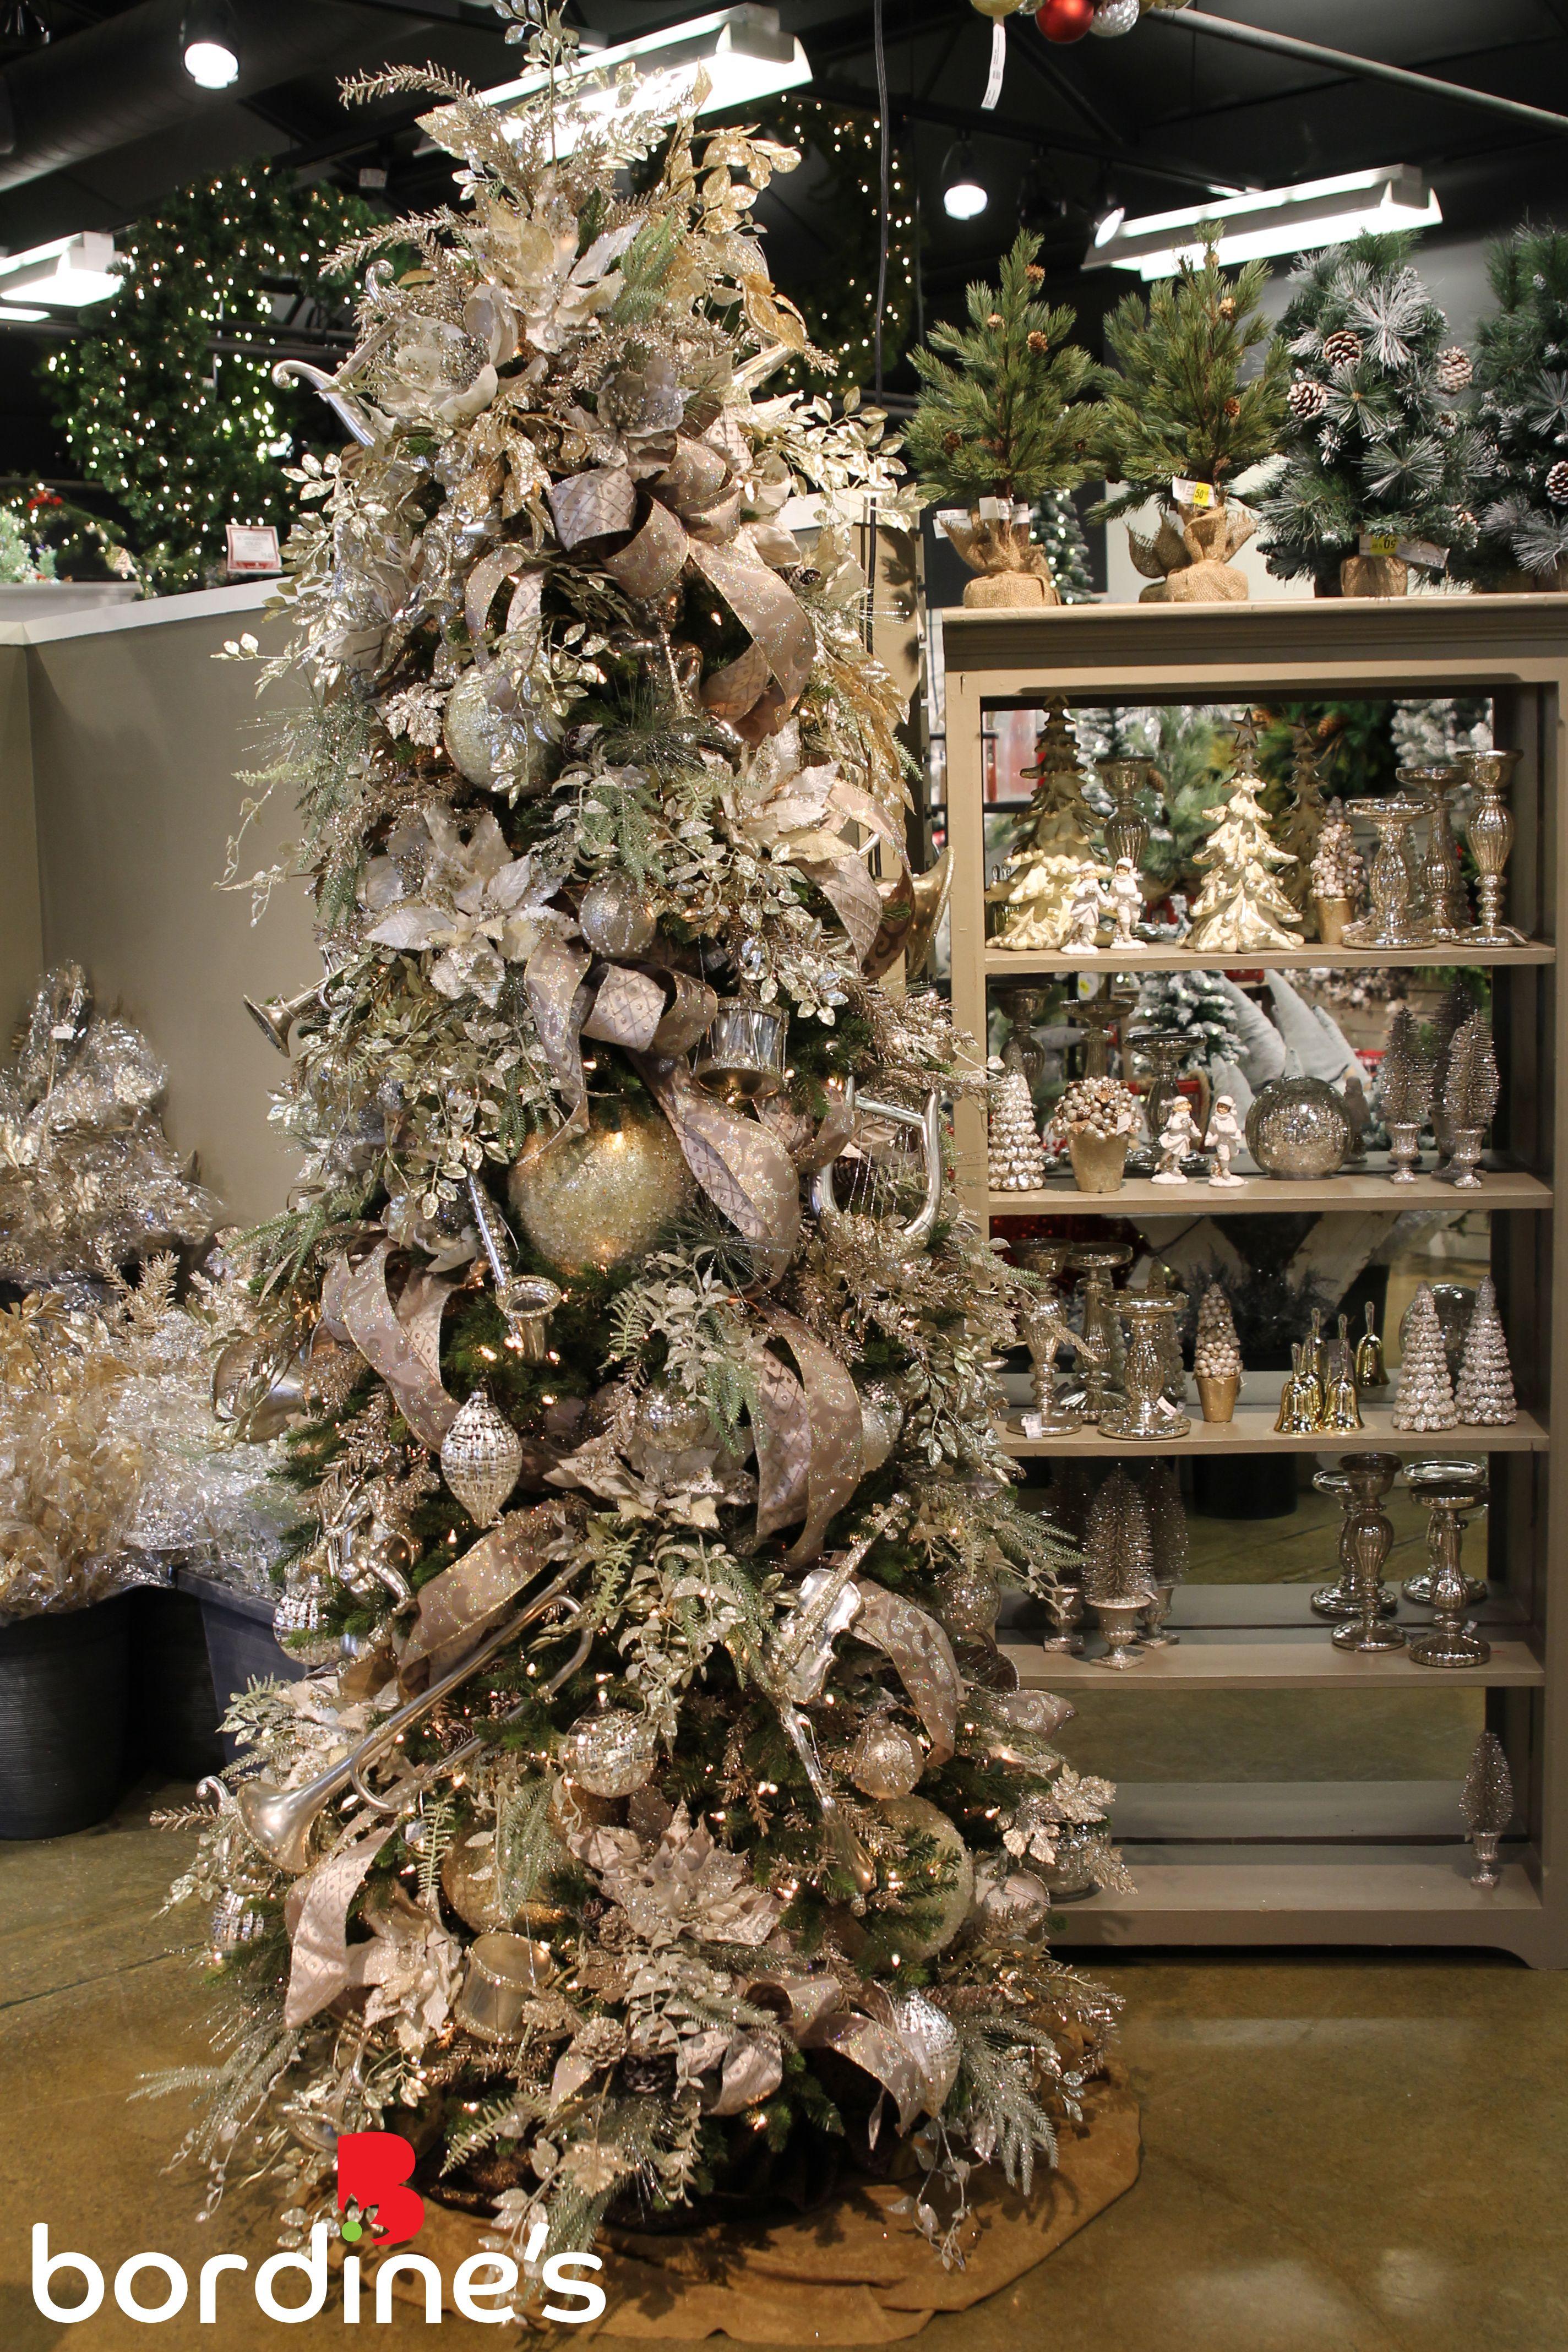 Pin By Bordine S On Bordine S Designer Christmas Trees Christmas Tree Decorations Diy Beautiful Christmas Trees Christmas Shop Window